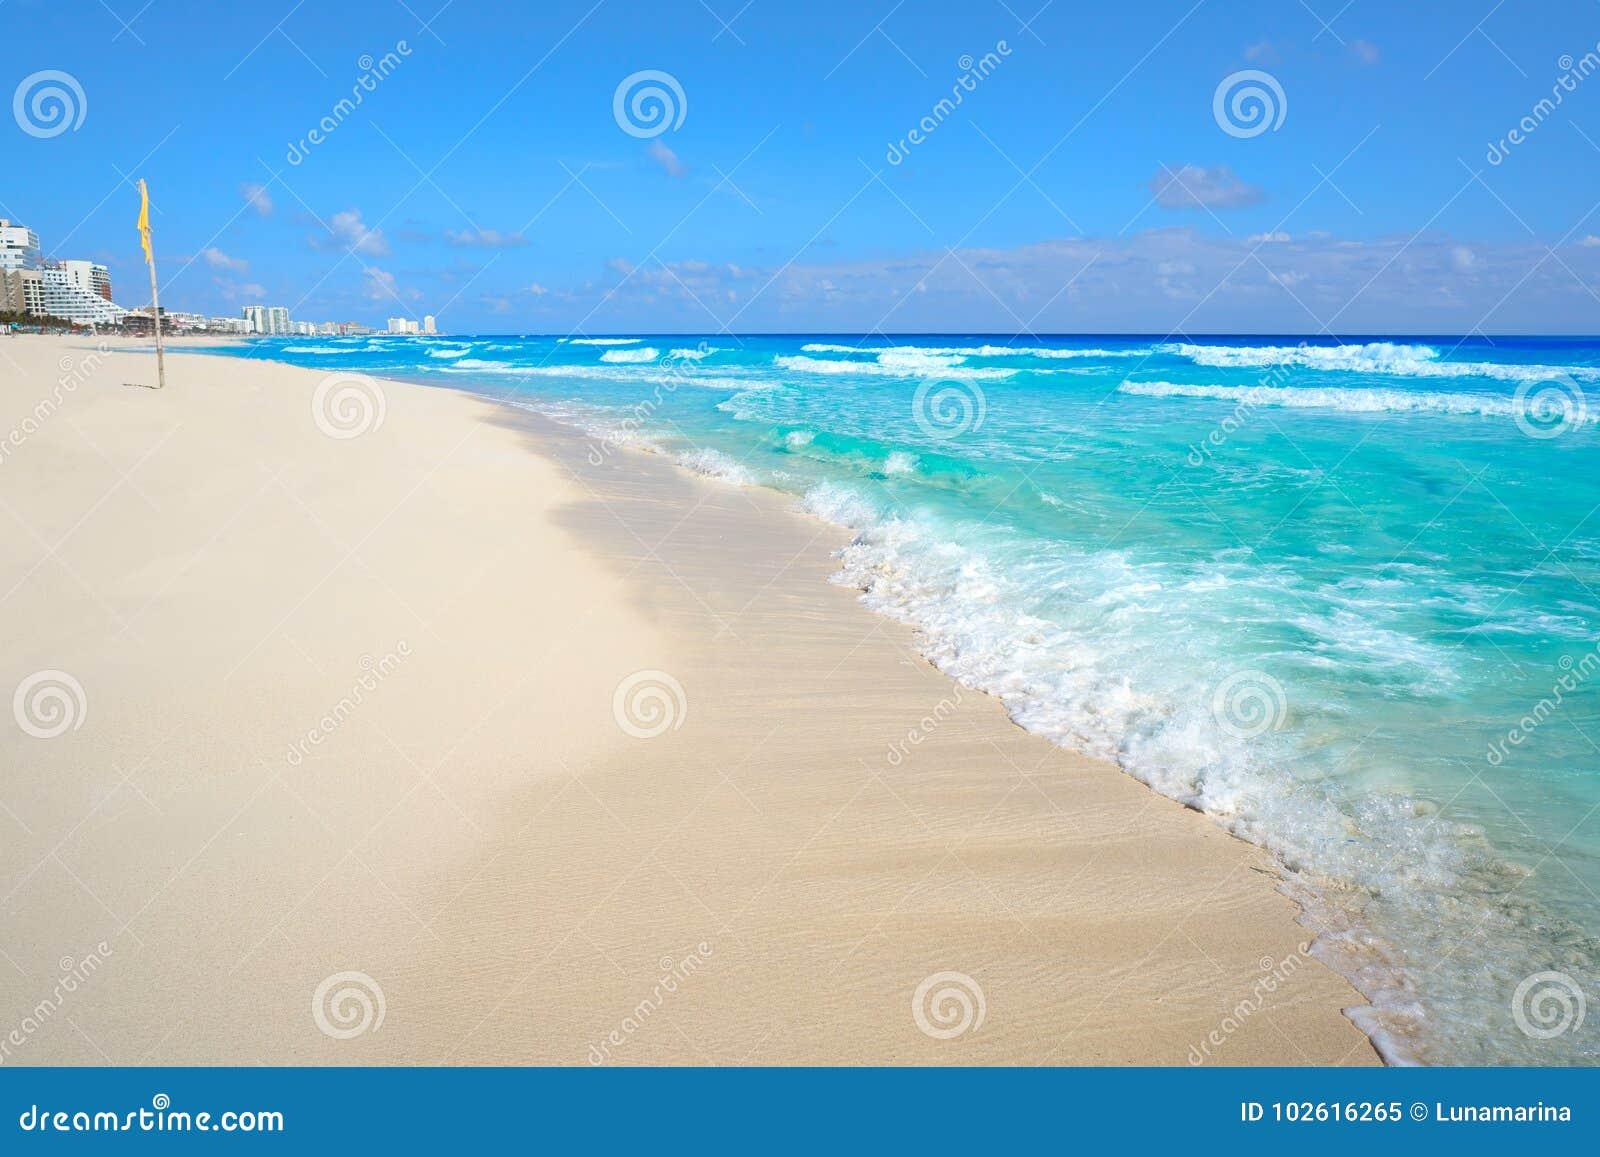 Playa Marlin i den Cancun stranden i Mexico